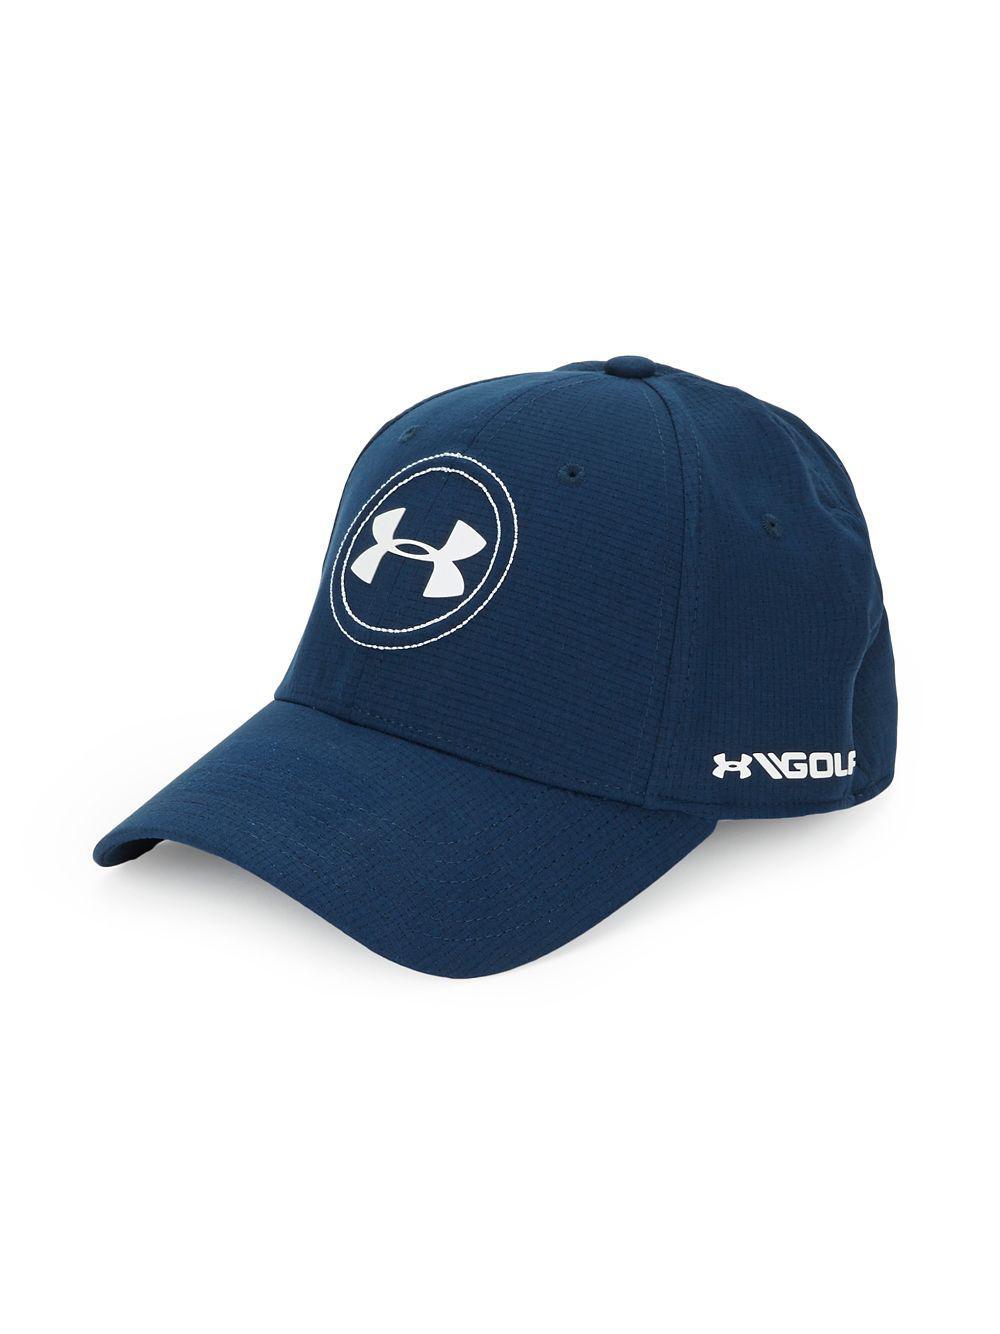 383c4089aa8 Under Armour Jordan Spieth Ua Tour Cap in Blue for Men - Lyst